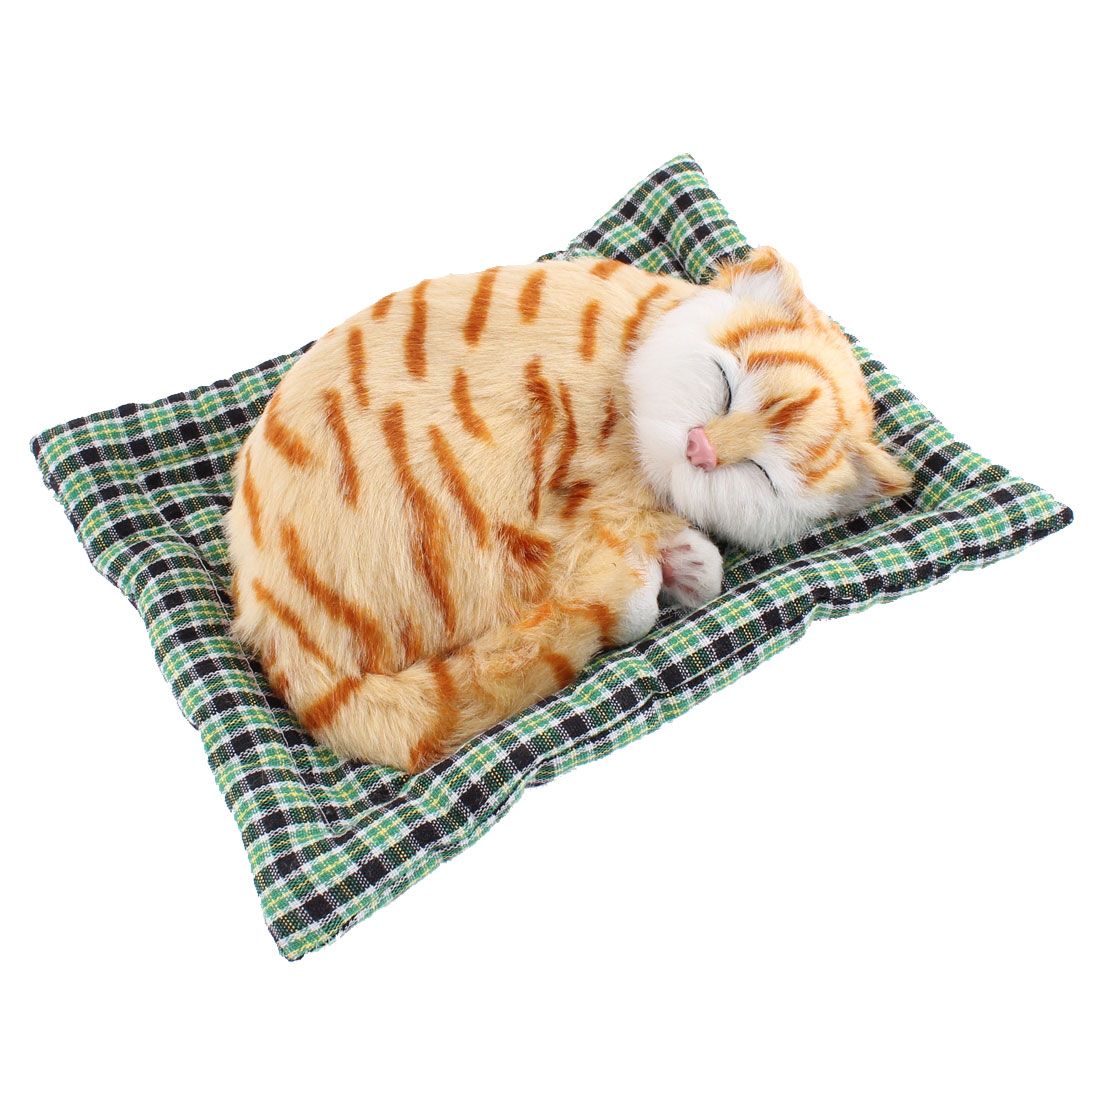 Home Simulation Sound Animal Sleeping Cat Craft Decoration